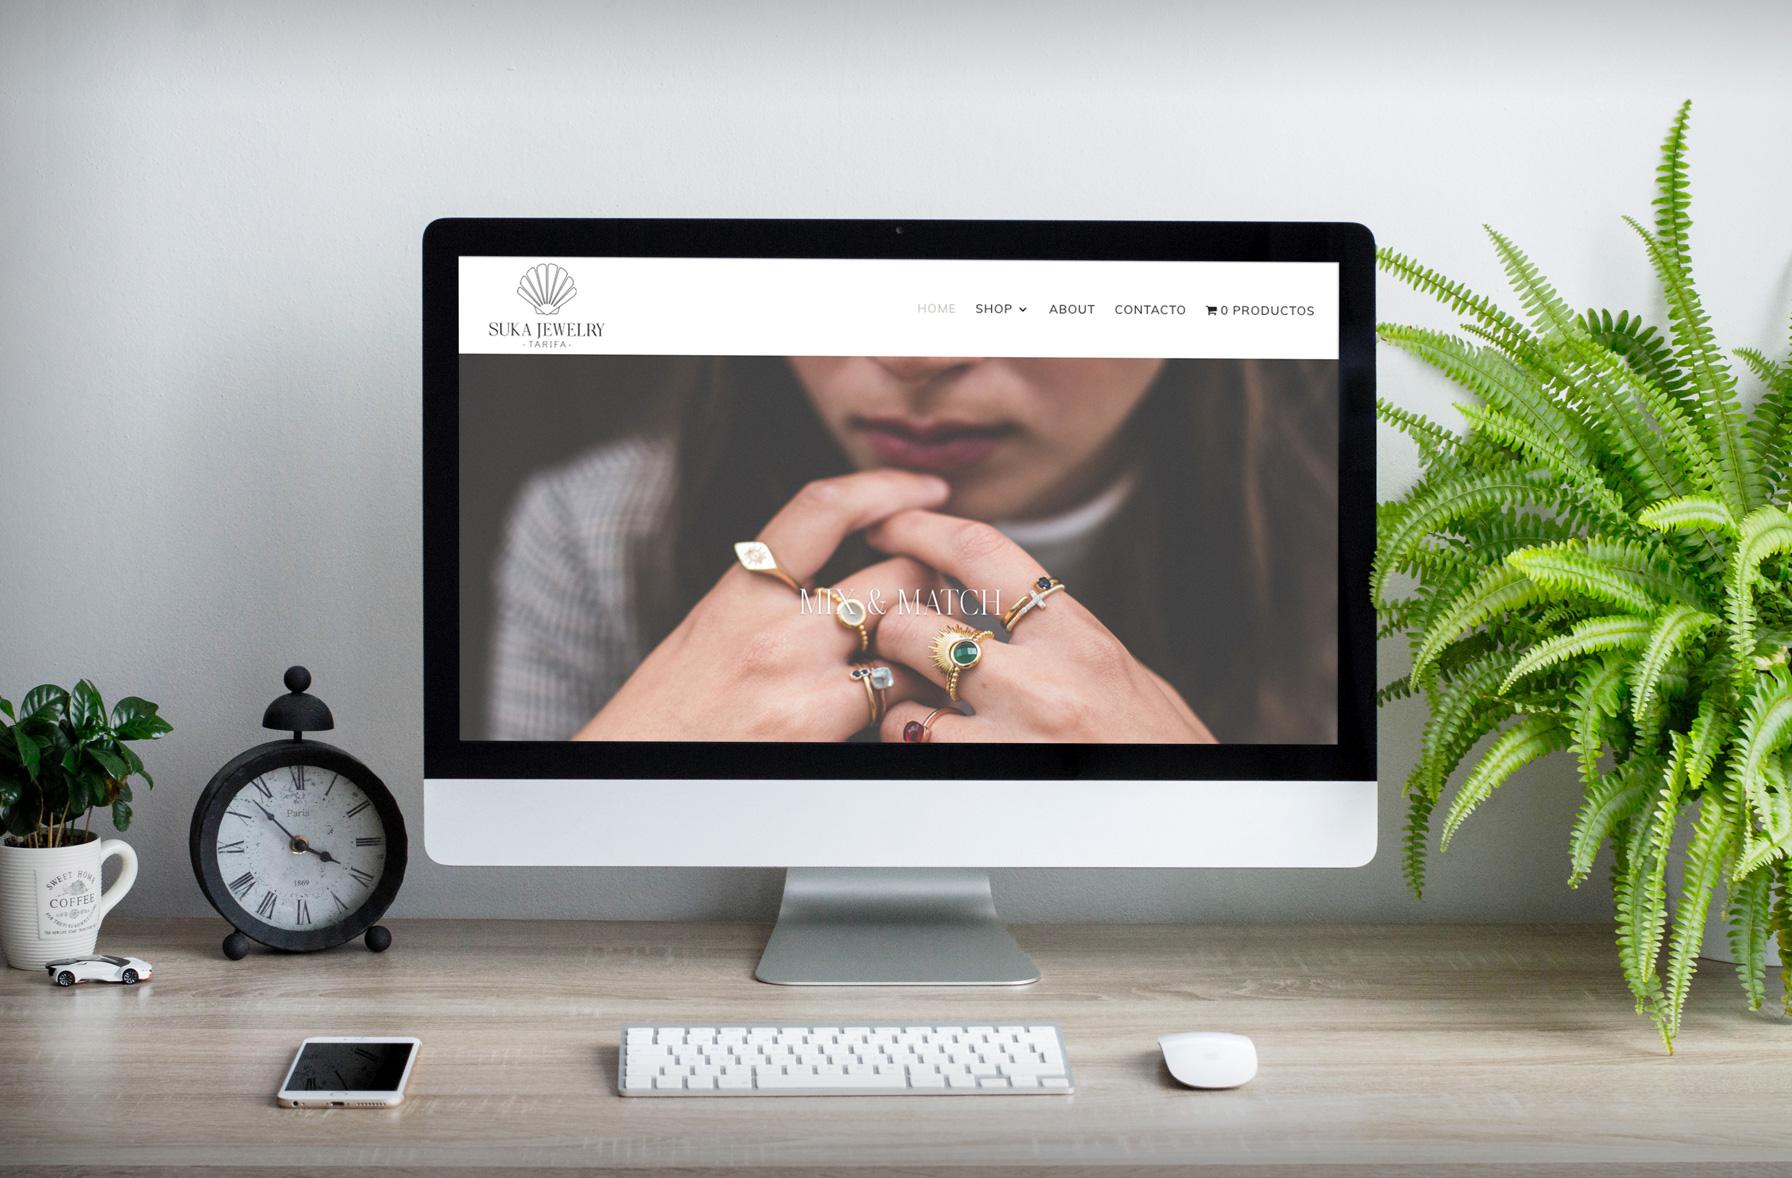 Web ecommer Suka Jewelry Piña Studio